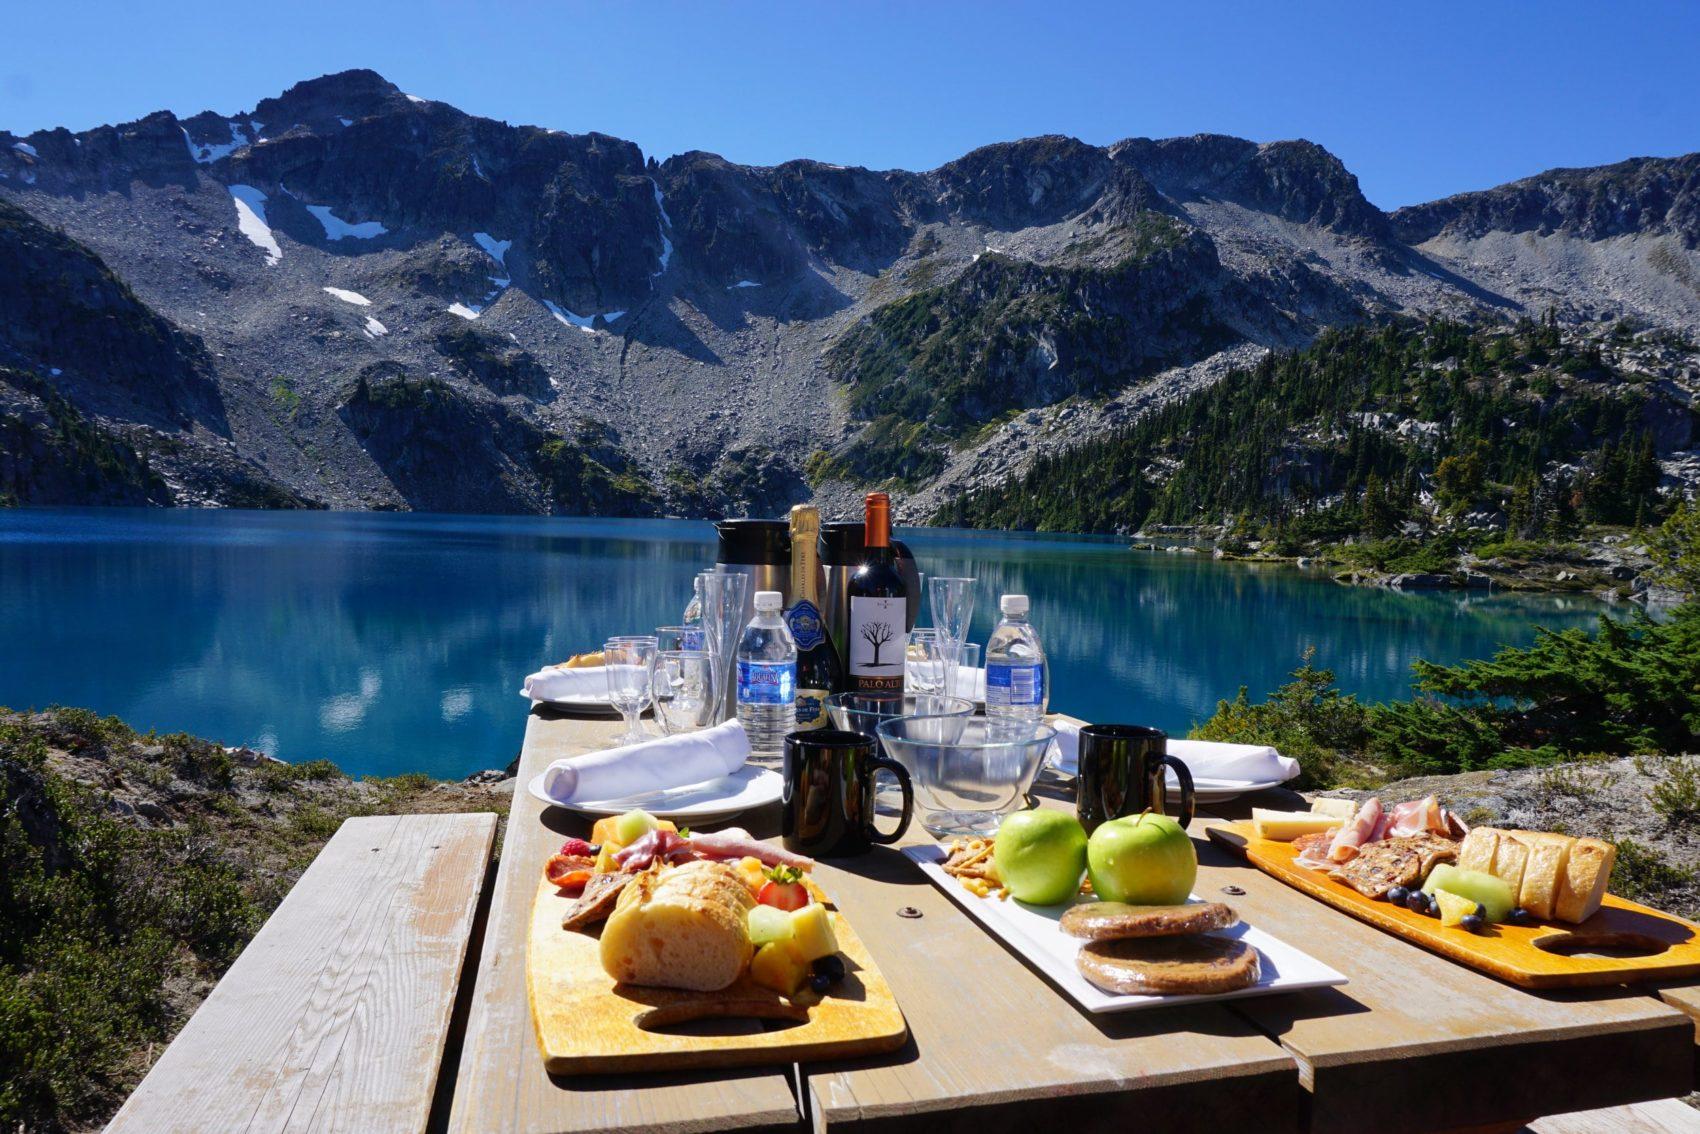 heli-paddling lunch